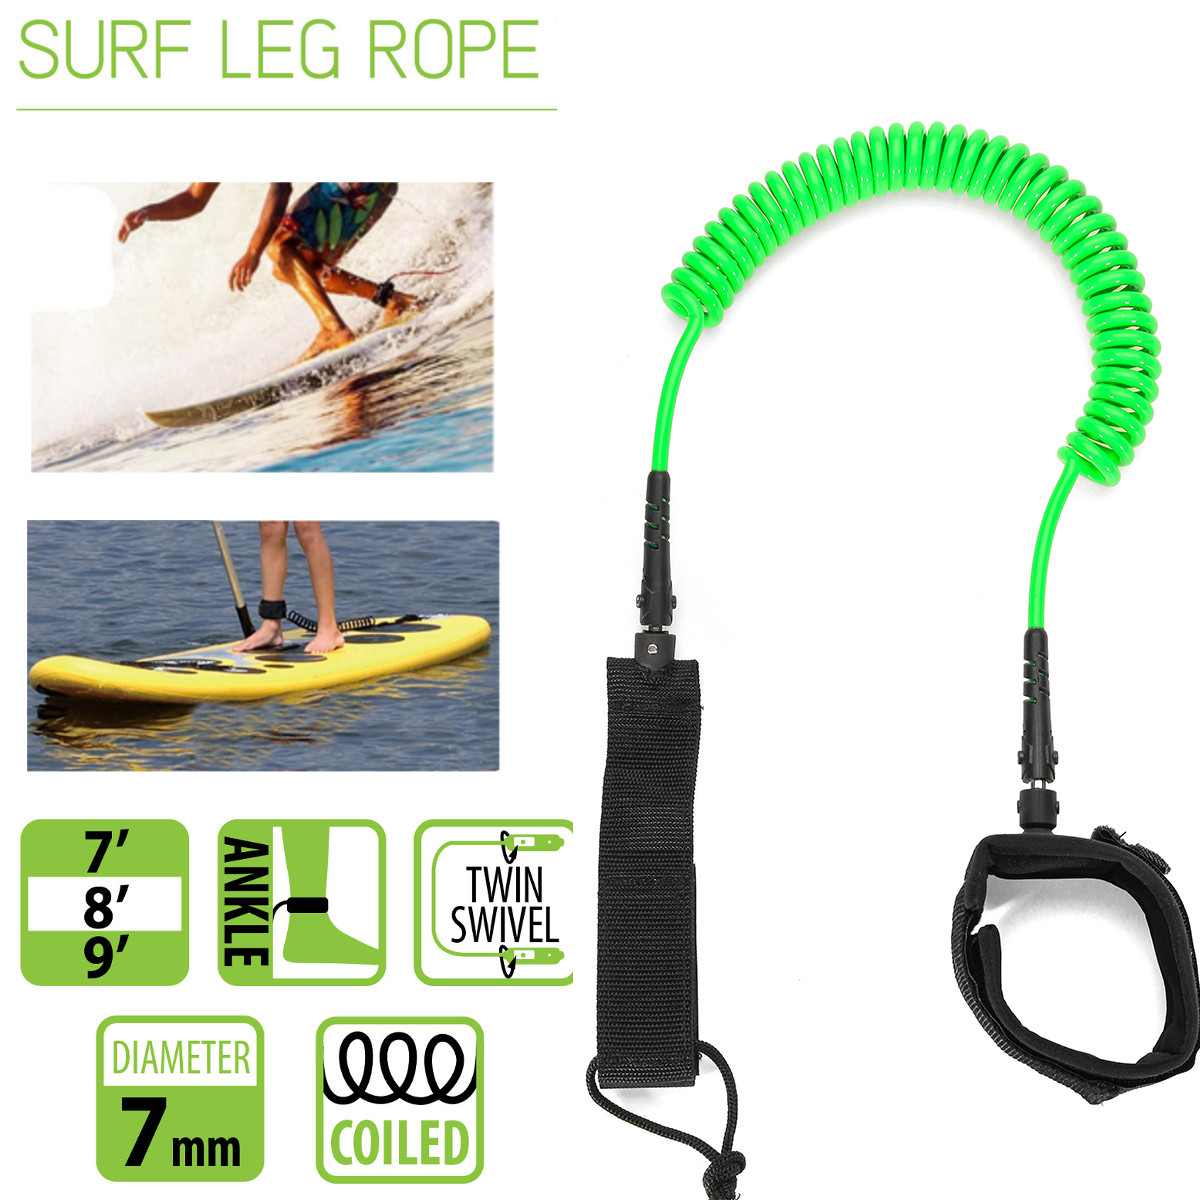 10 Color Optional SolUptanisu Surfboard Ankle leash Durable Bodyboard TPU Surfboard Coiled Wrist Leash Water Board Surfing Accessories 7MM//10ft